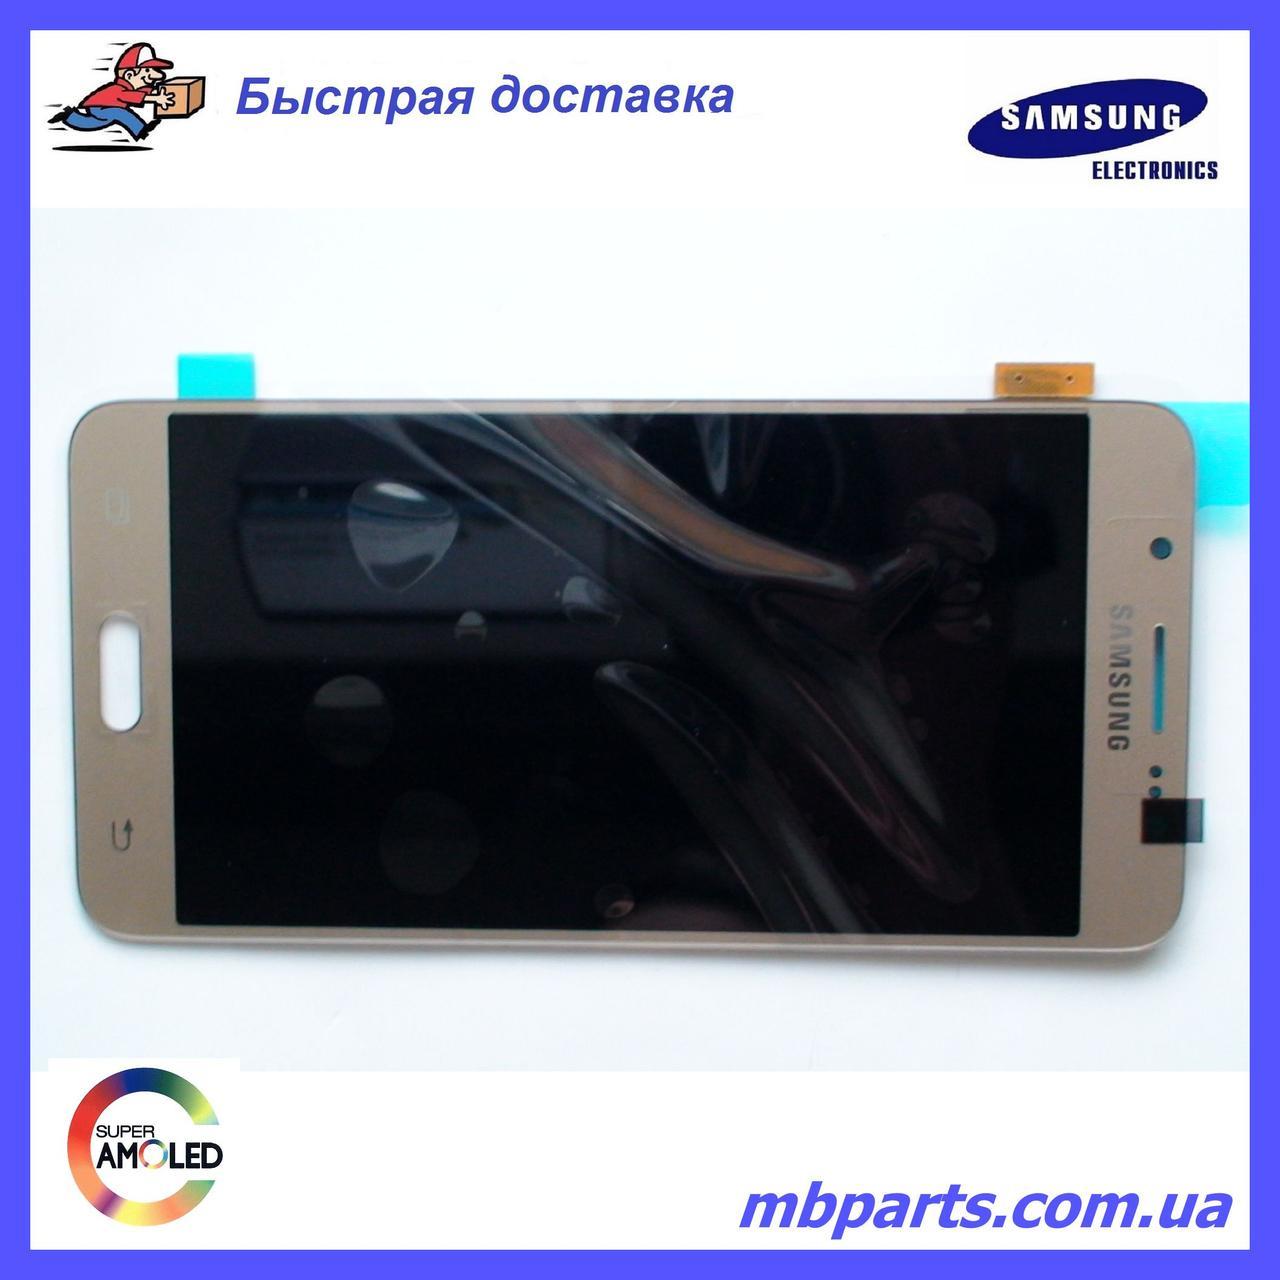 Дисплей с сенсором Samsung J510 Galaxy J5 Gold оригинал, GH97-19466A